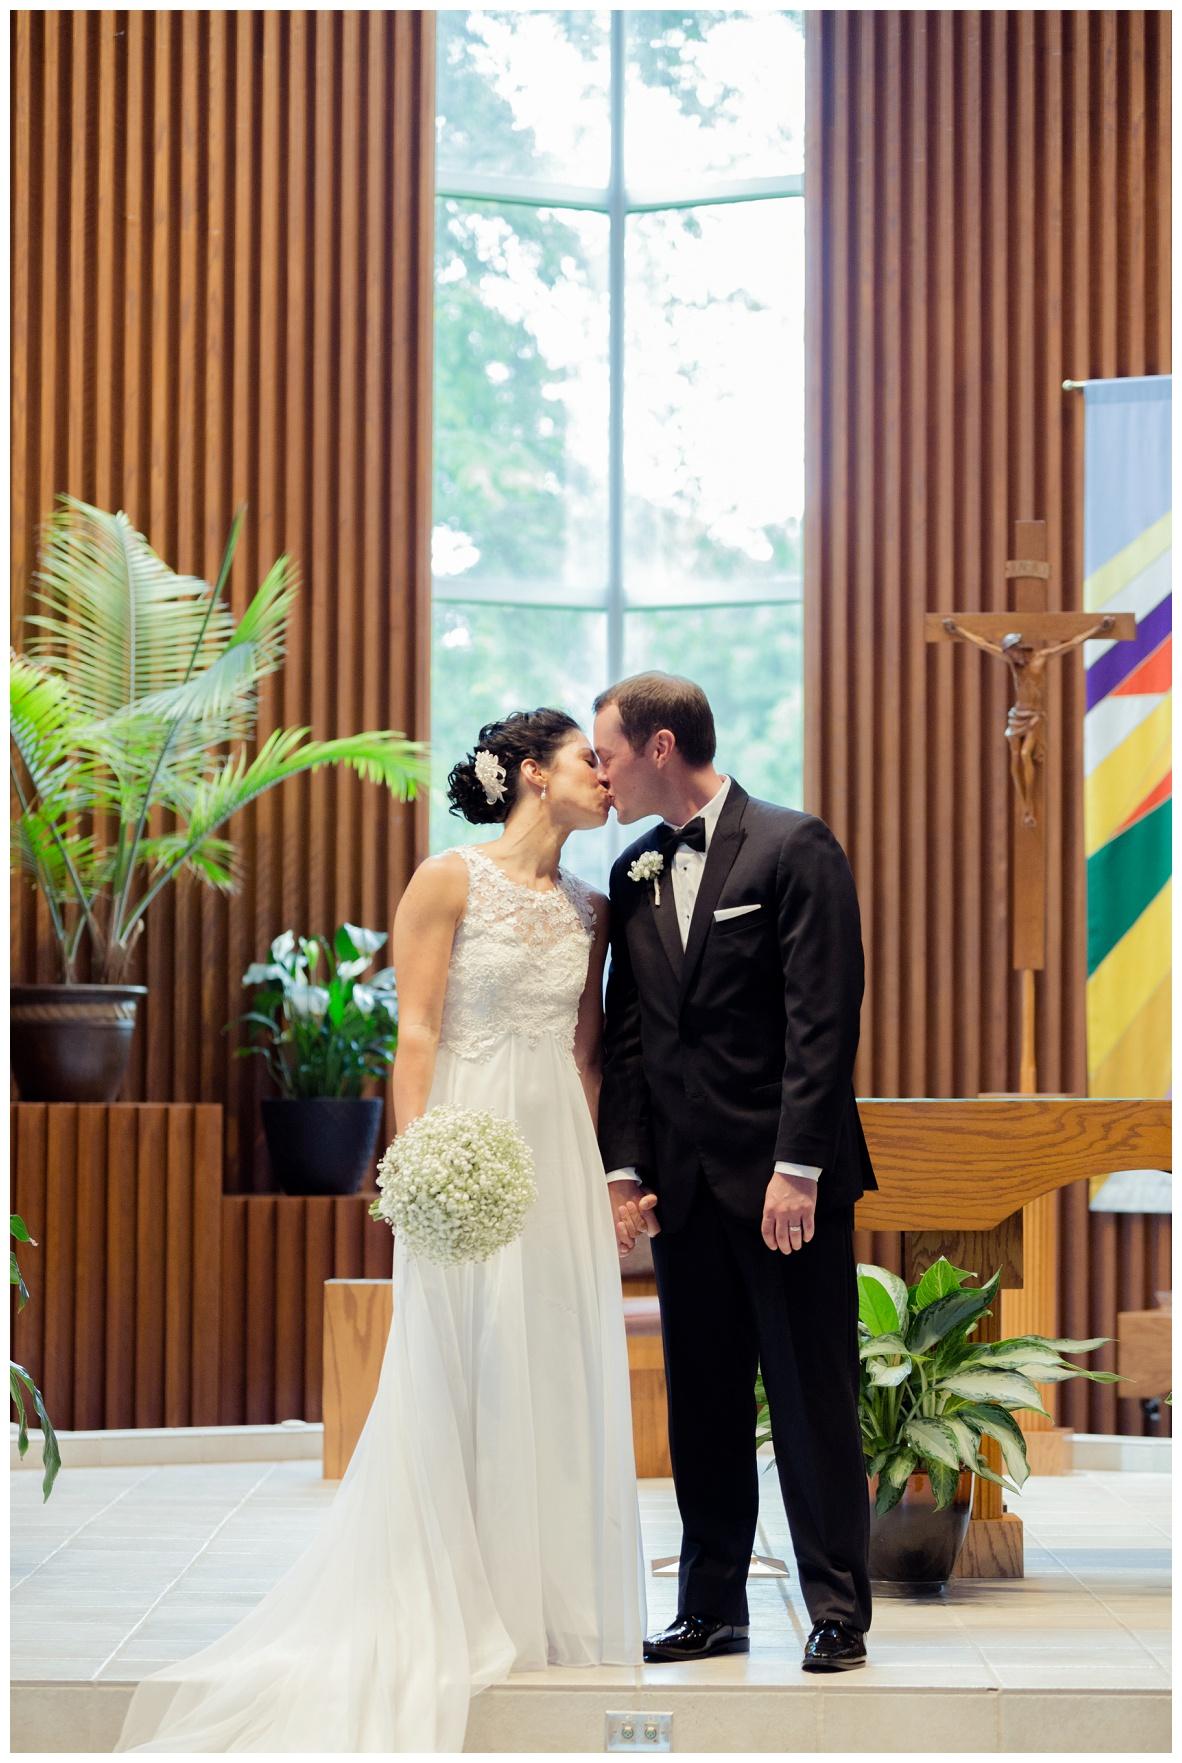 The Wedding of Danielle and Matt_0039.jpg